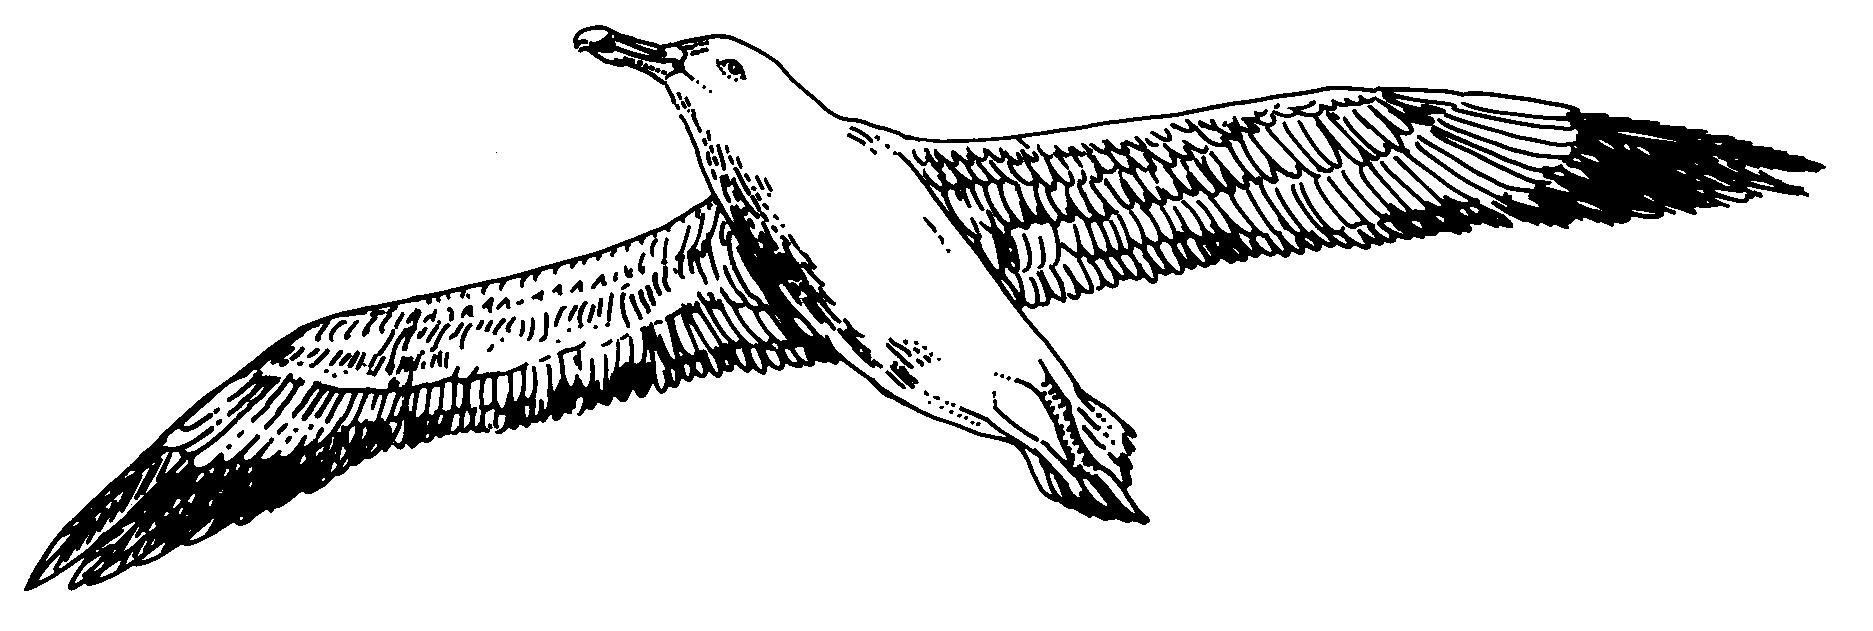 Albatross art drawing.